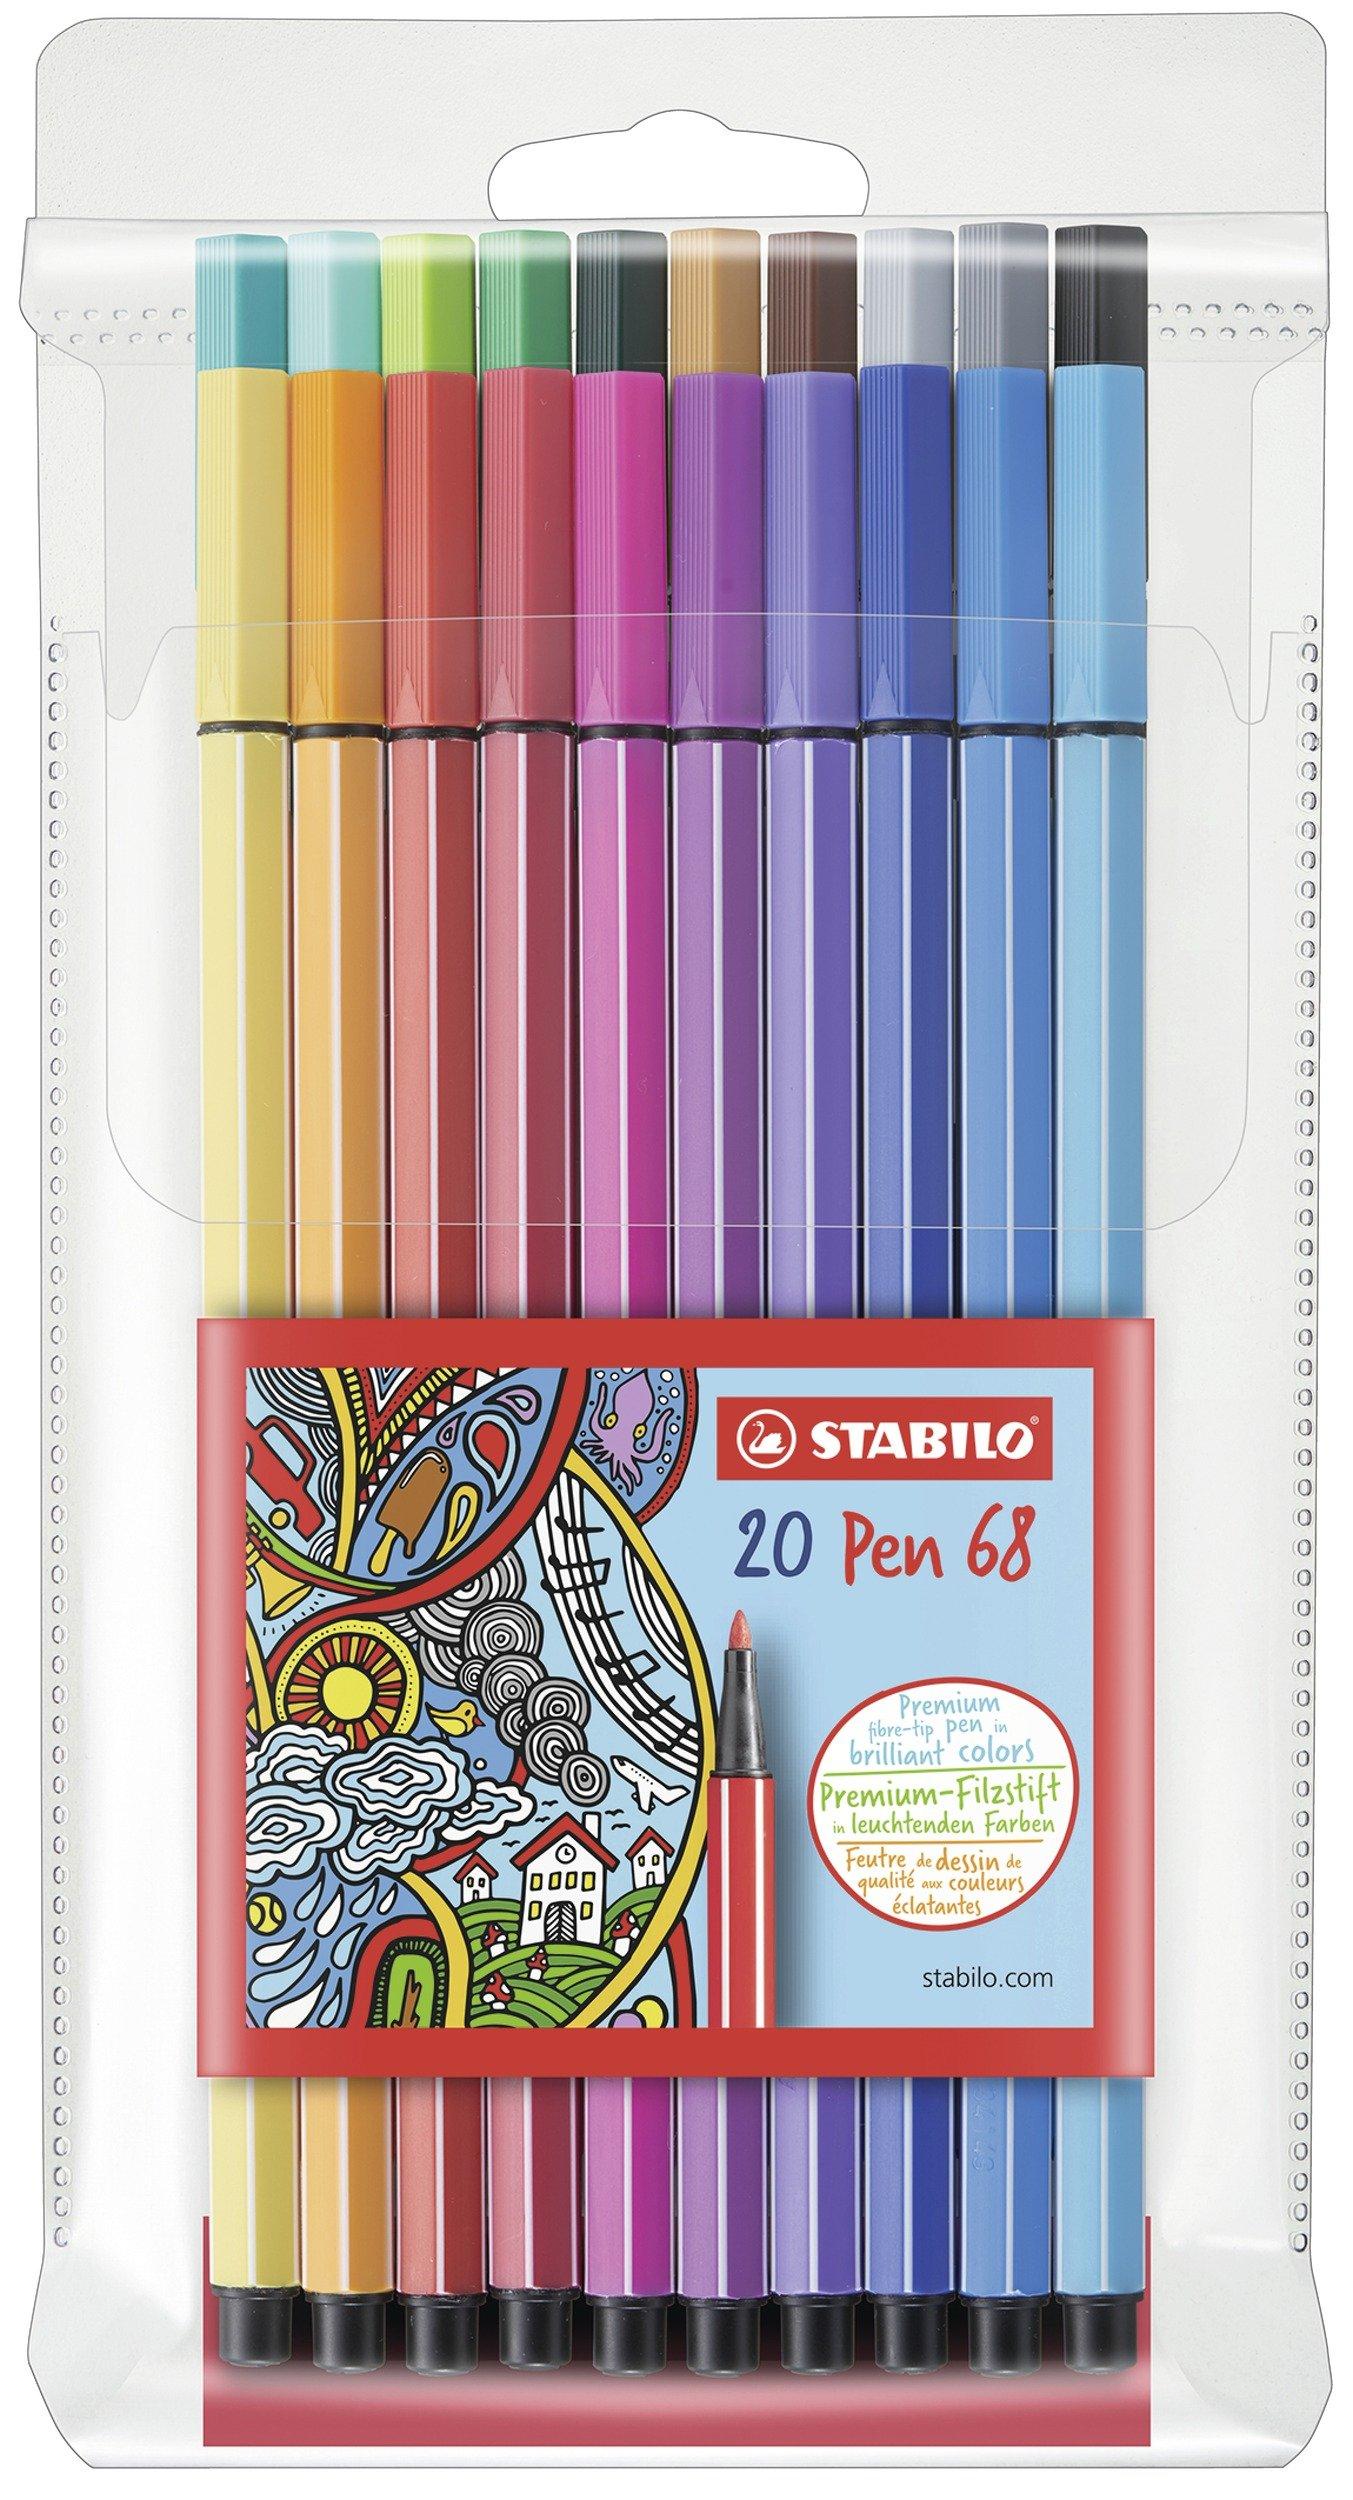 Stabilo Pen 68 Coloring Felt-tip Marker Pen, 1 mm - 20-Color Wallet Set